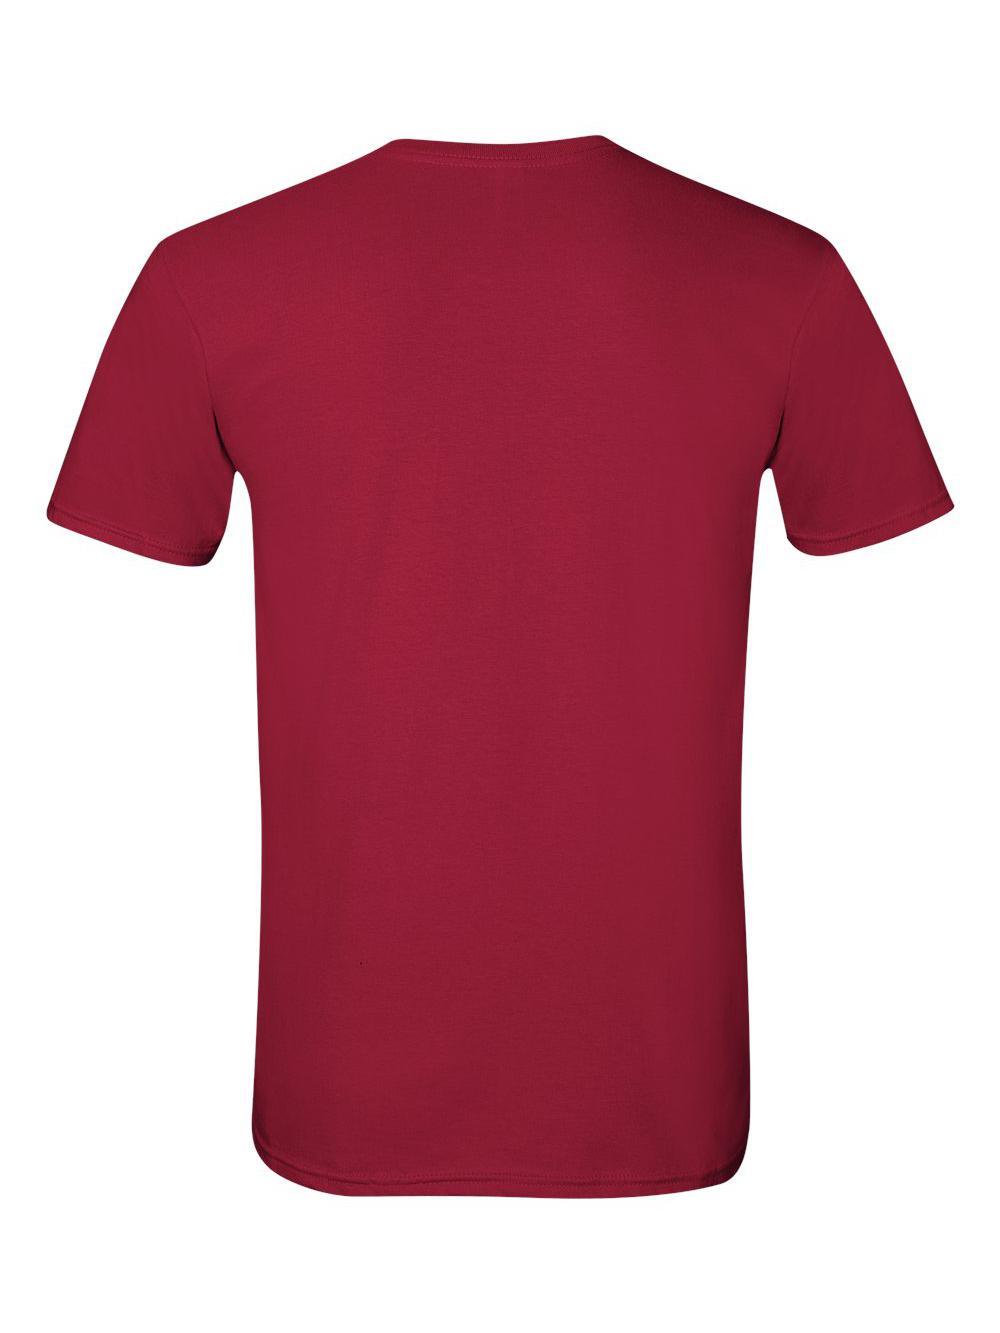 Gildan-Softstyle-T-Shirt-64000 thumbnail 25